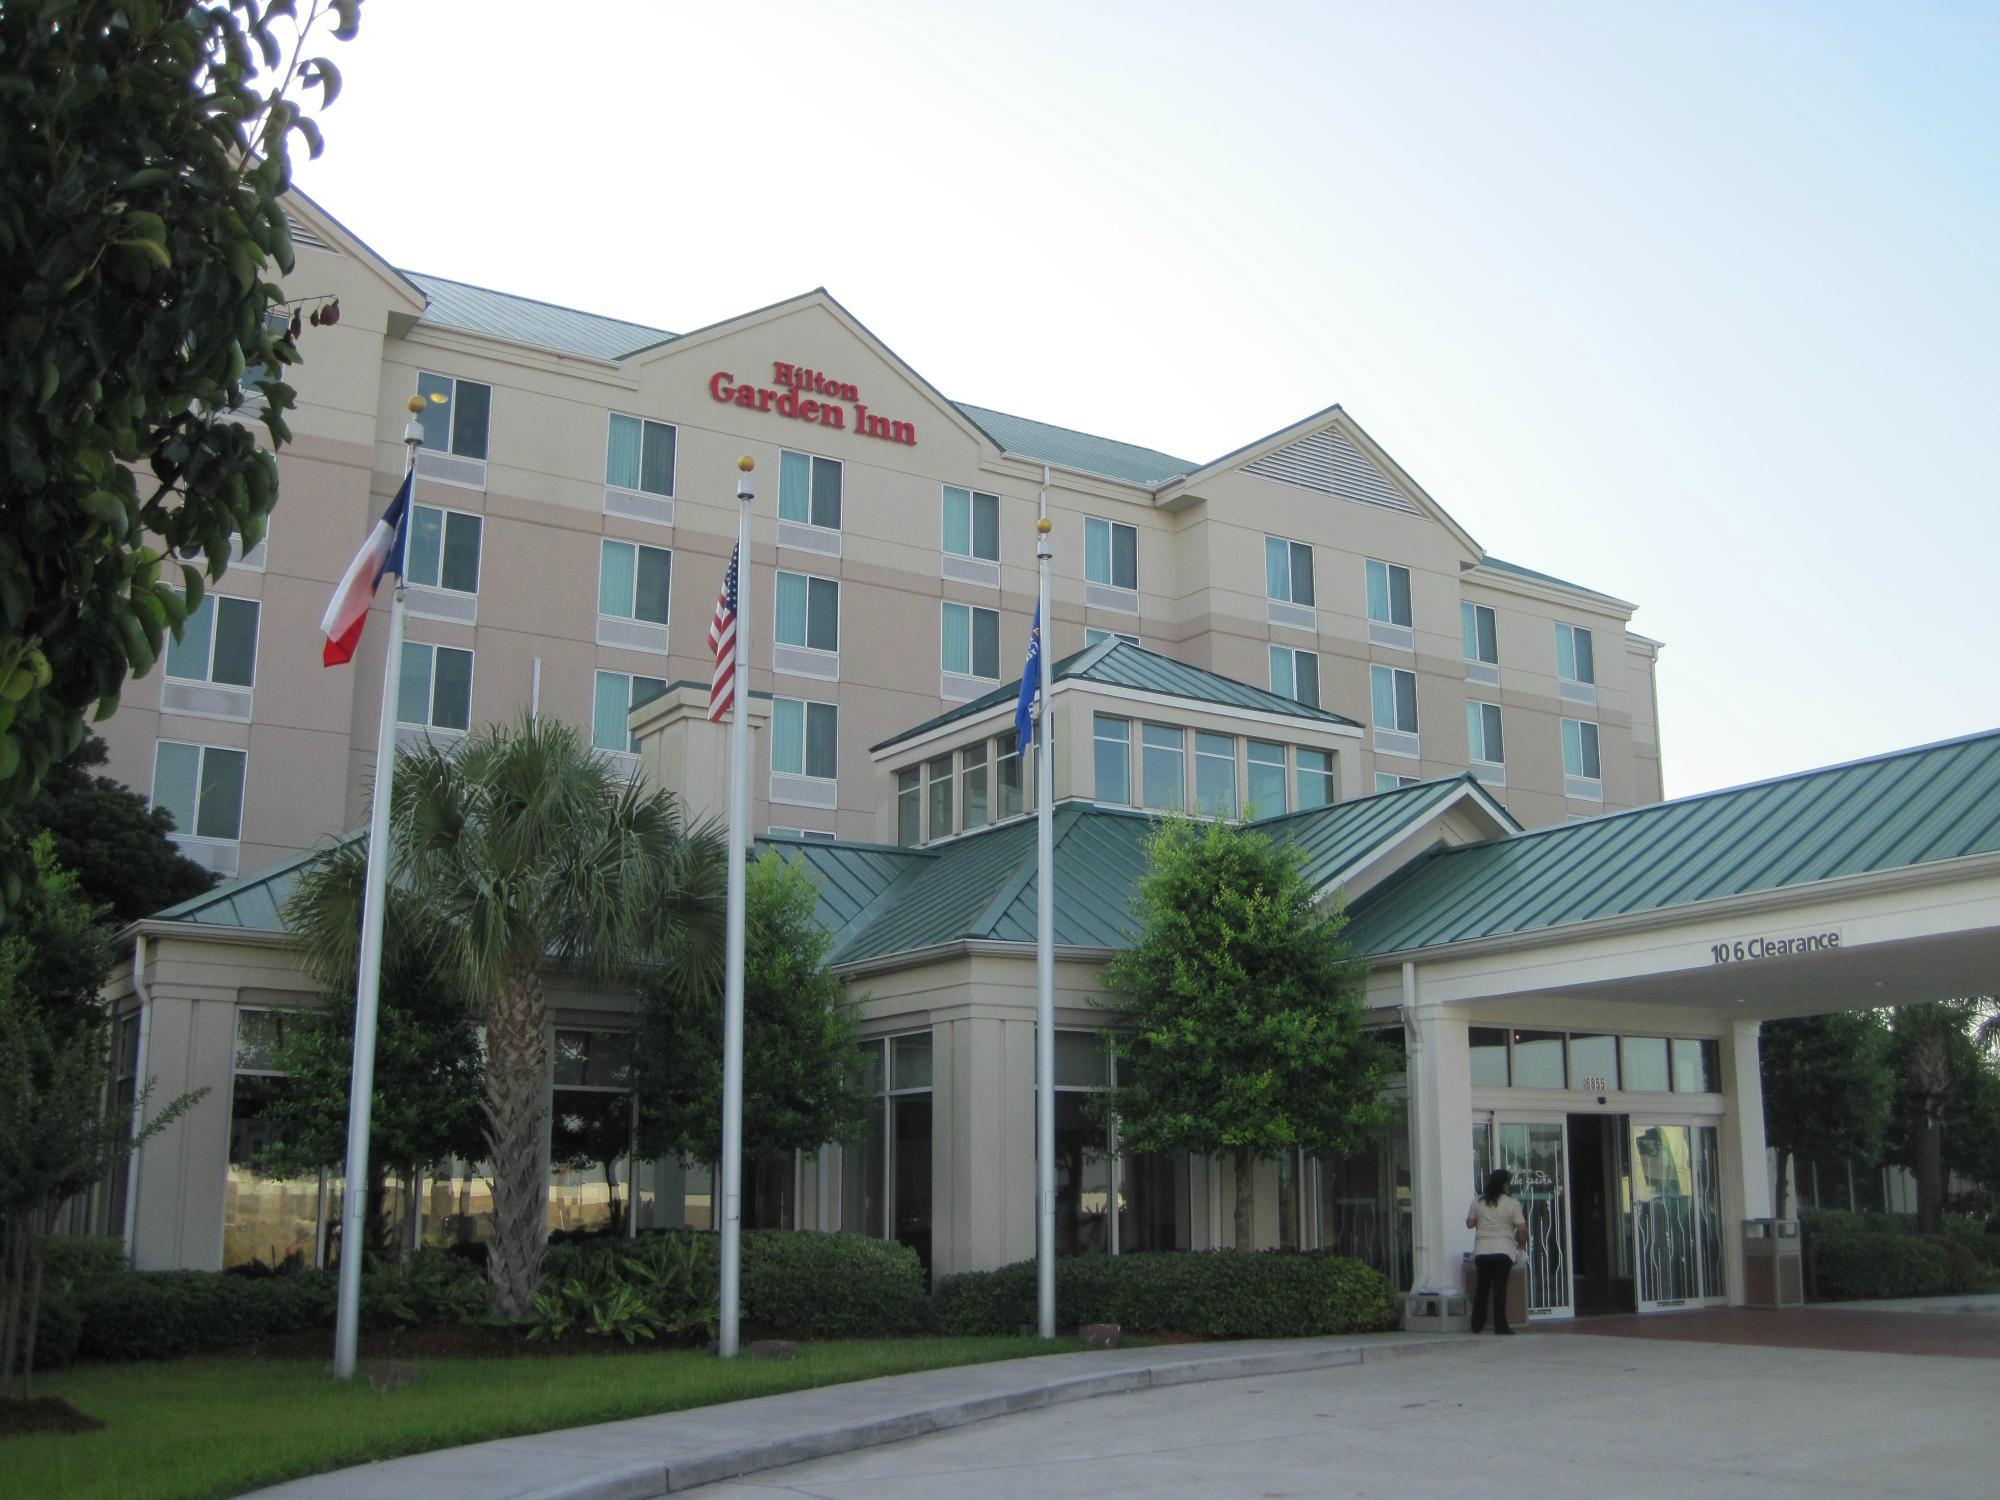 Hilton Garden Inn Houston Westbelt Tx 2018 Hotel Review